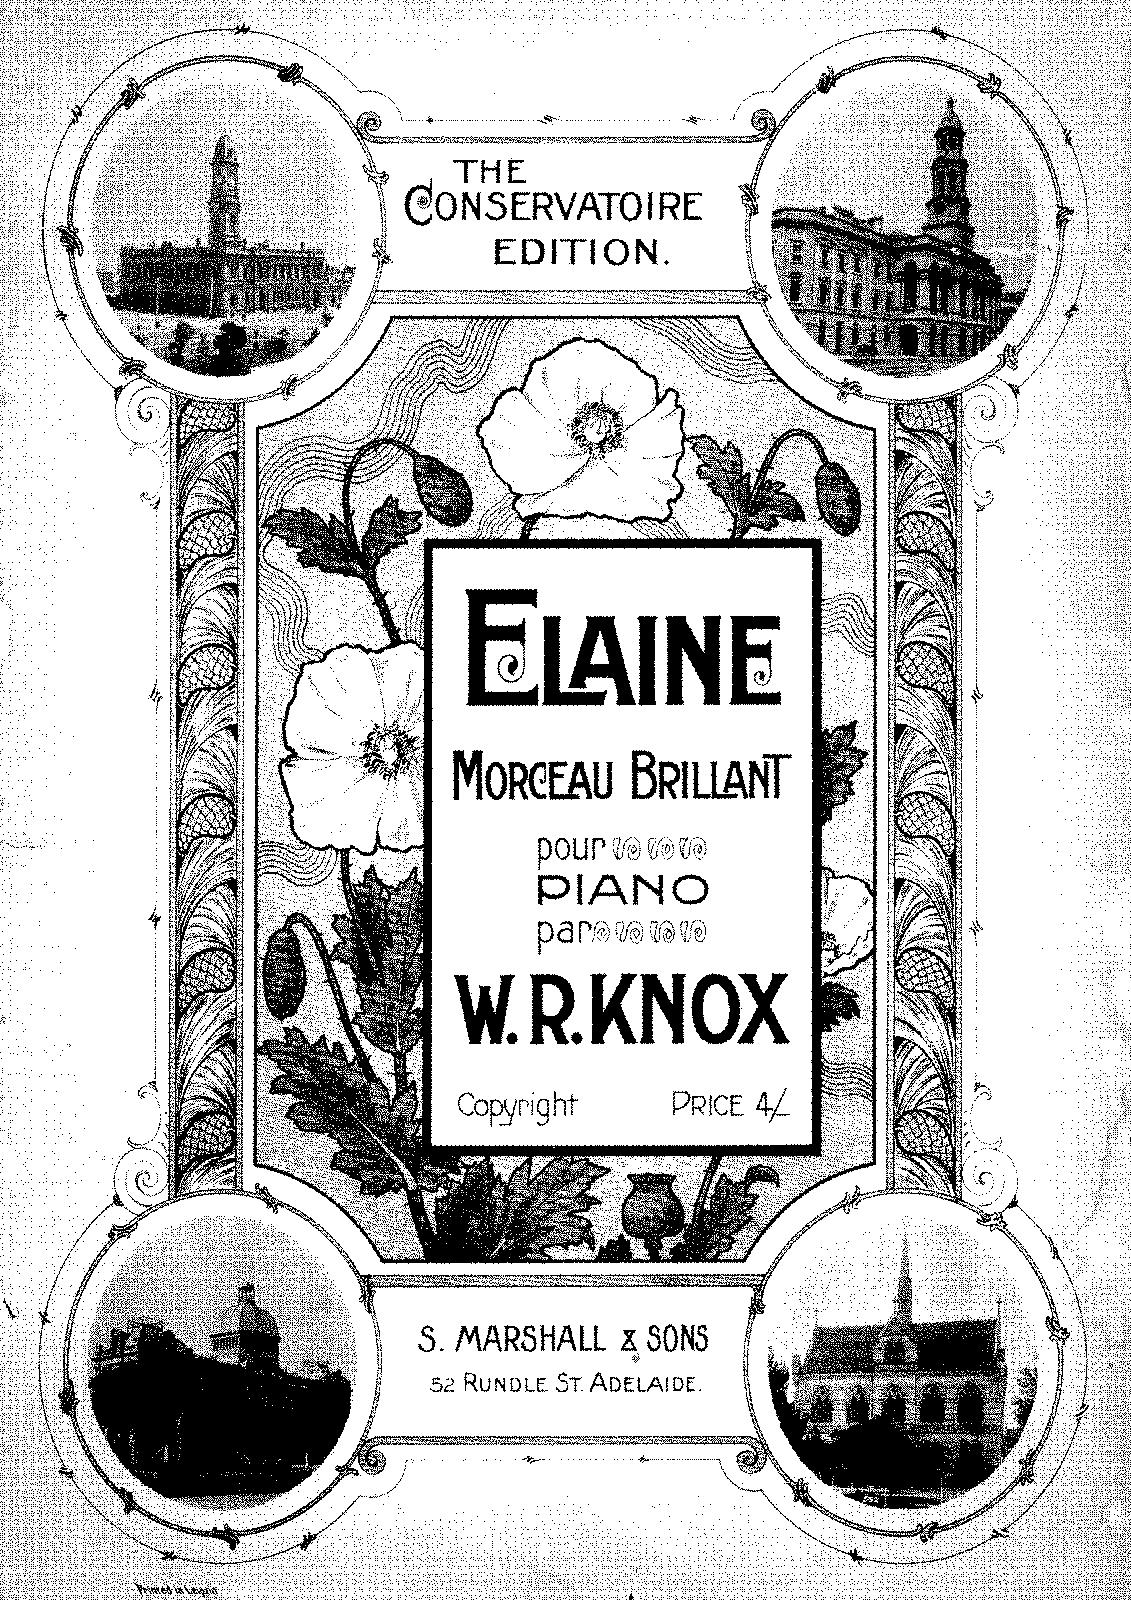 Elaine (Knox, William Robert) - IMSLP/Petrucci Music Library: Free